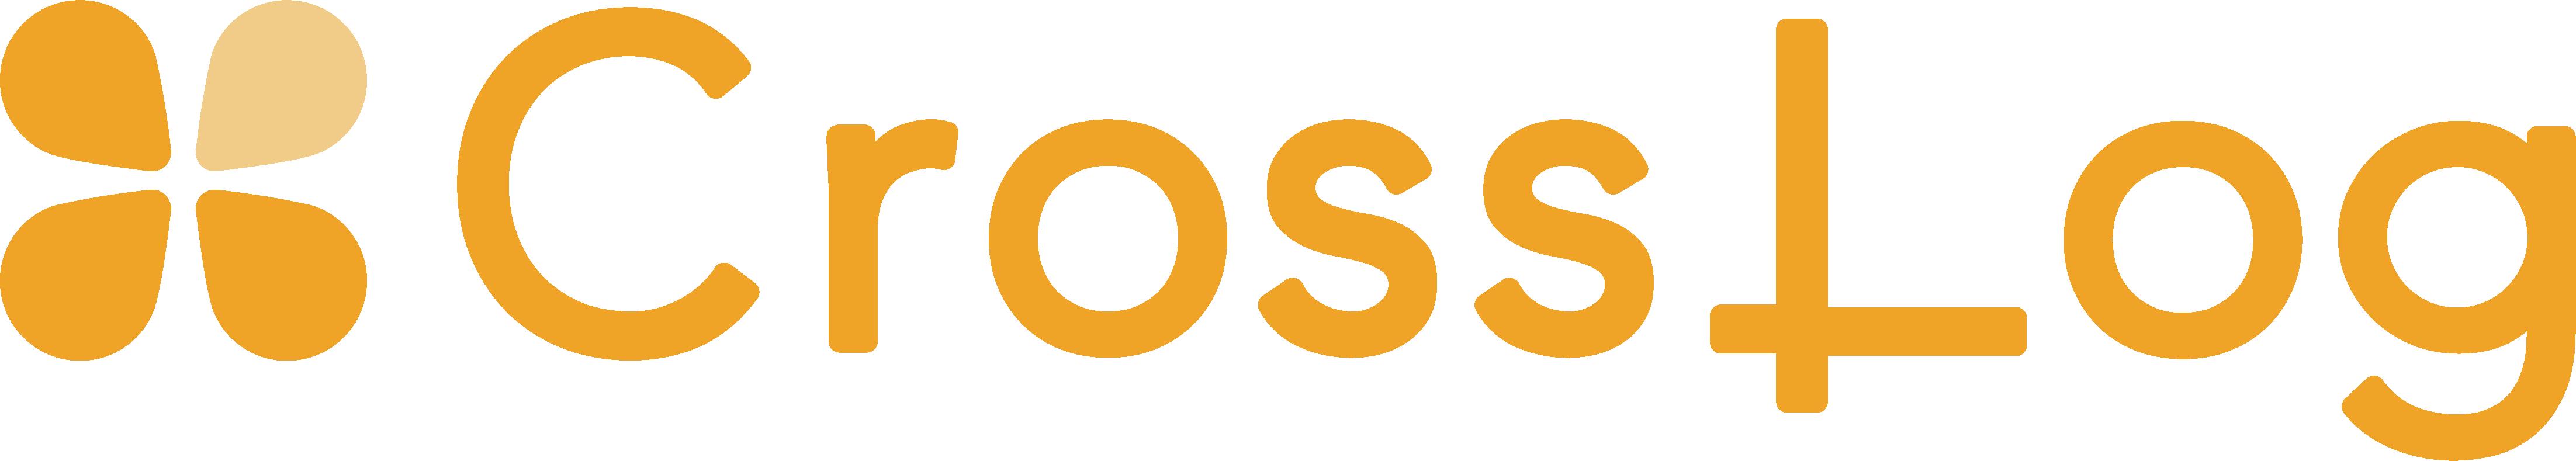 crosslog